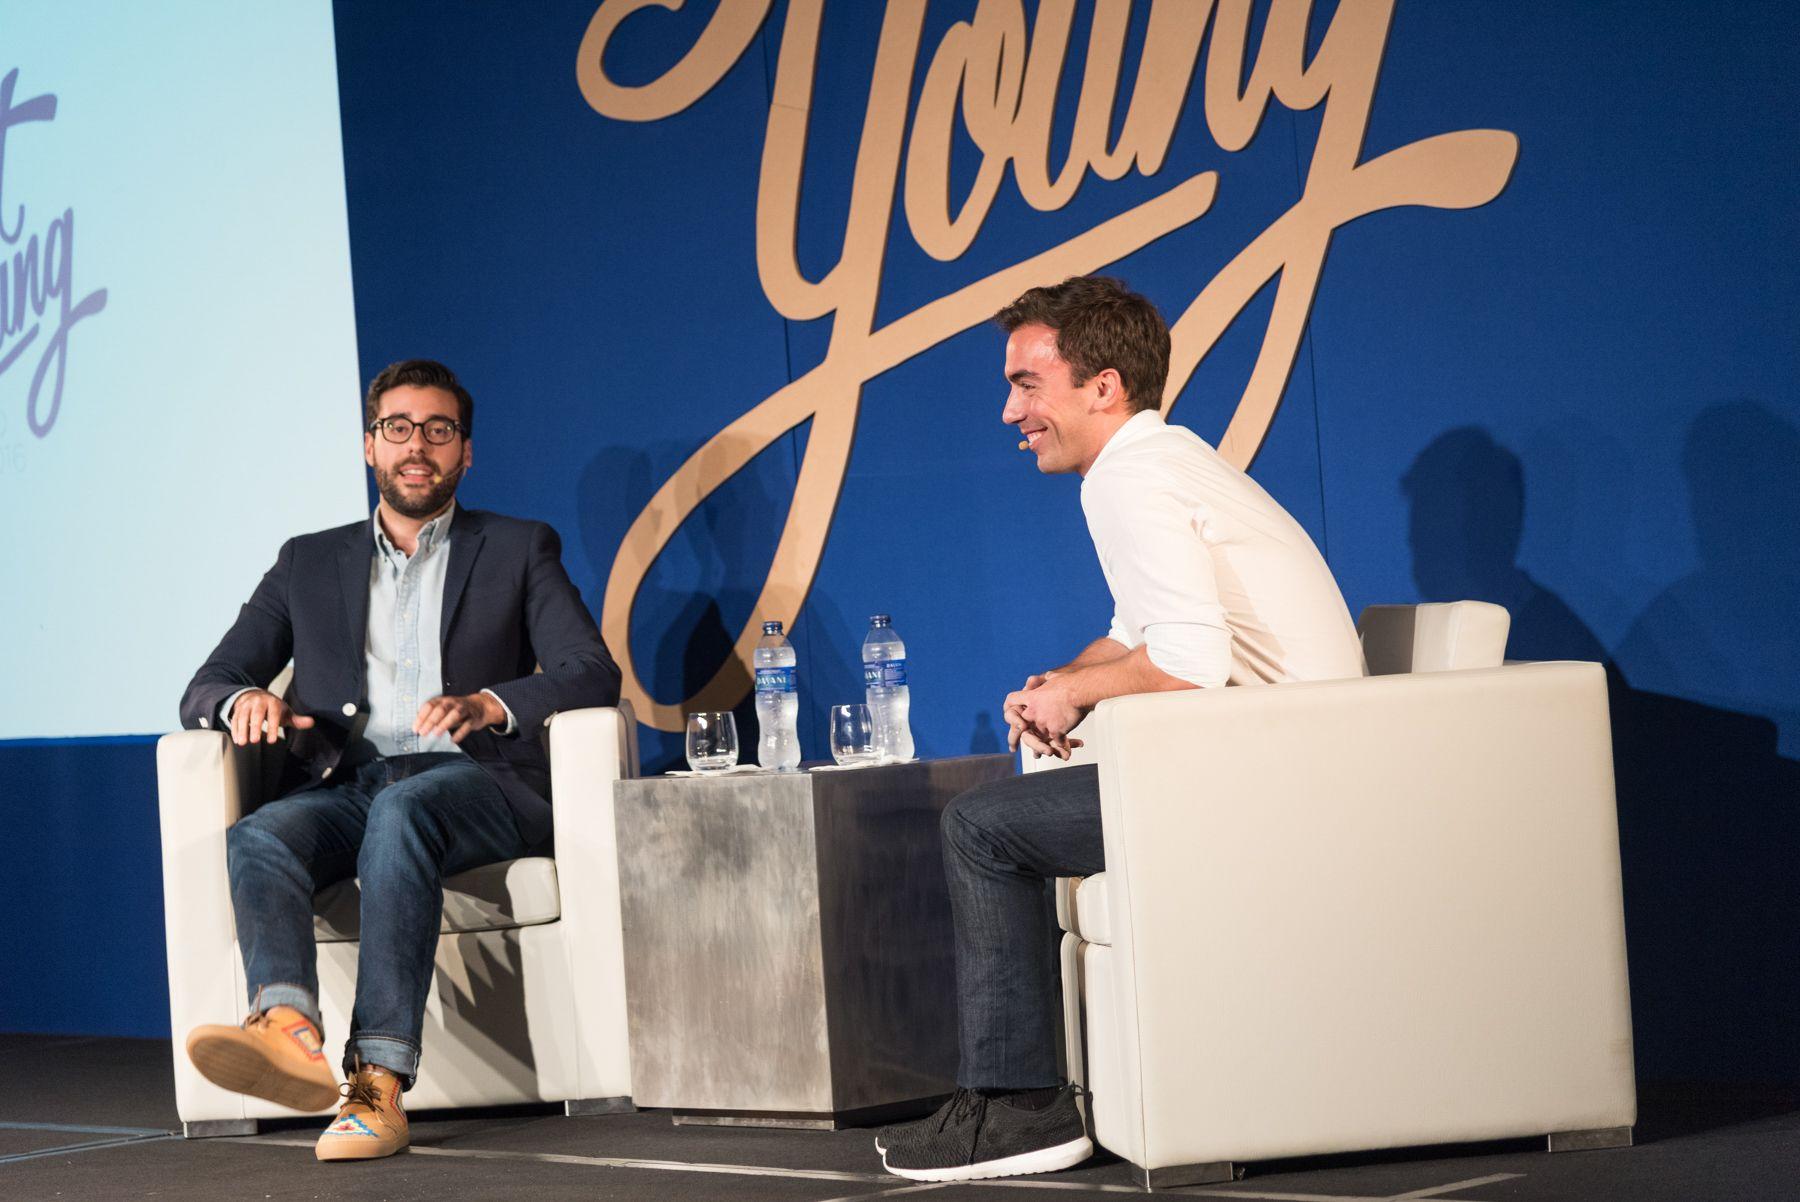 Start Young 2016 inspiró cientos de jóvenes